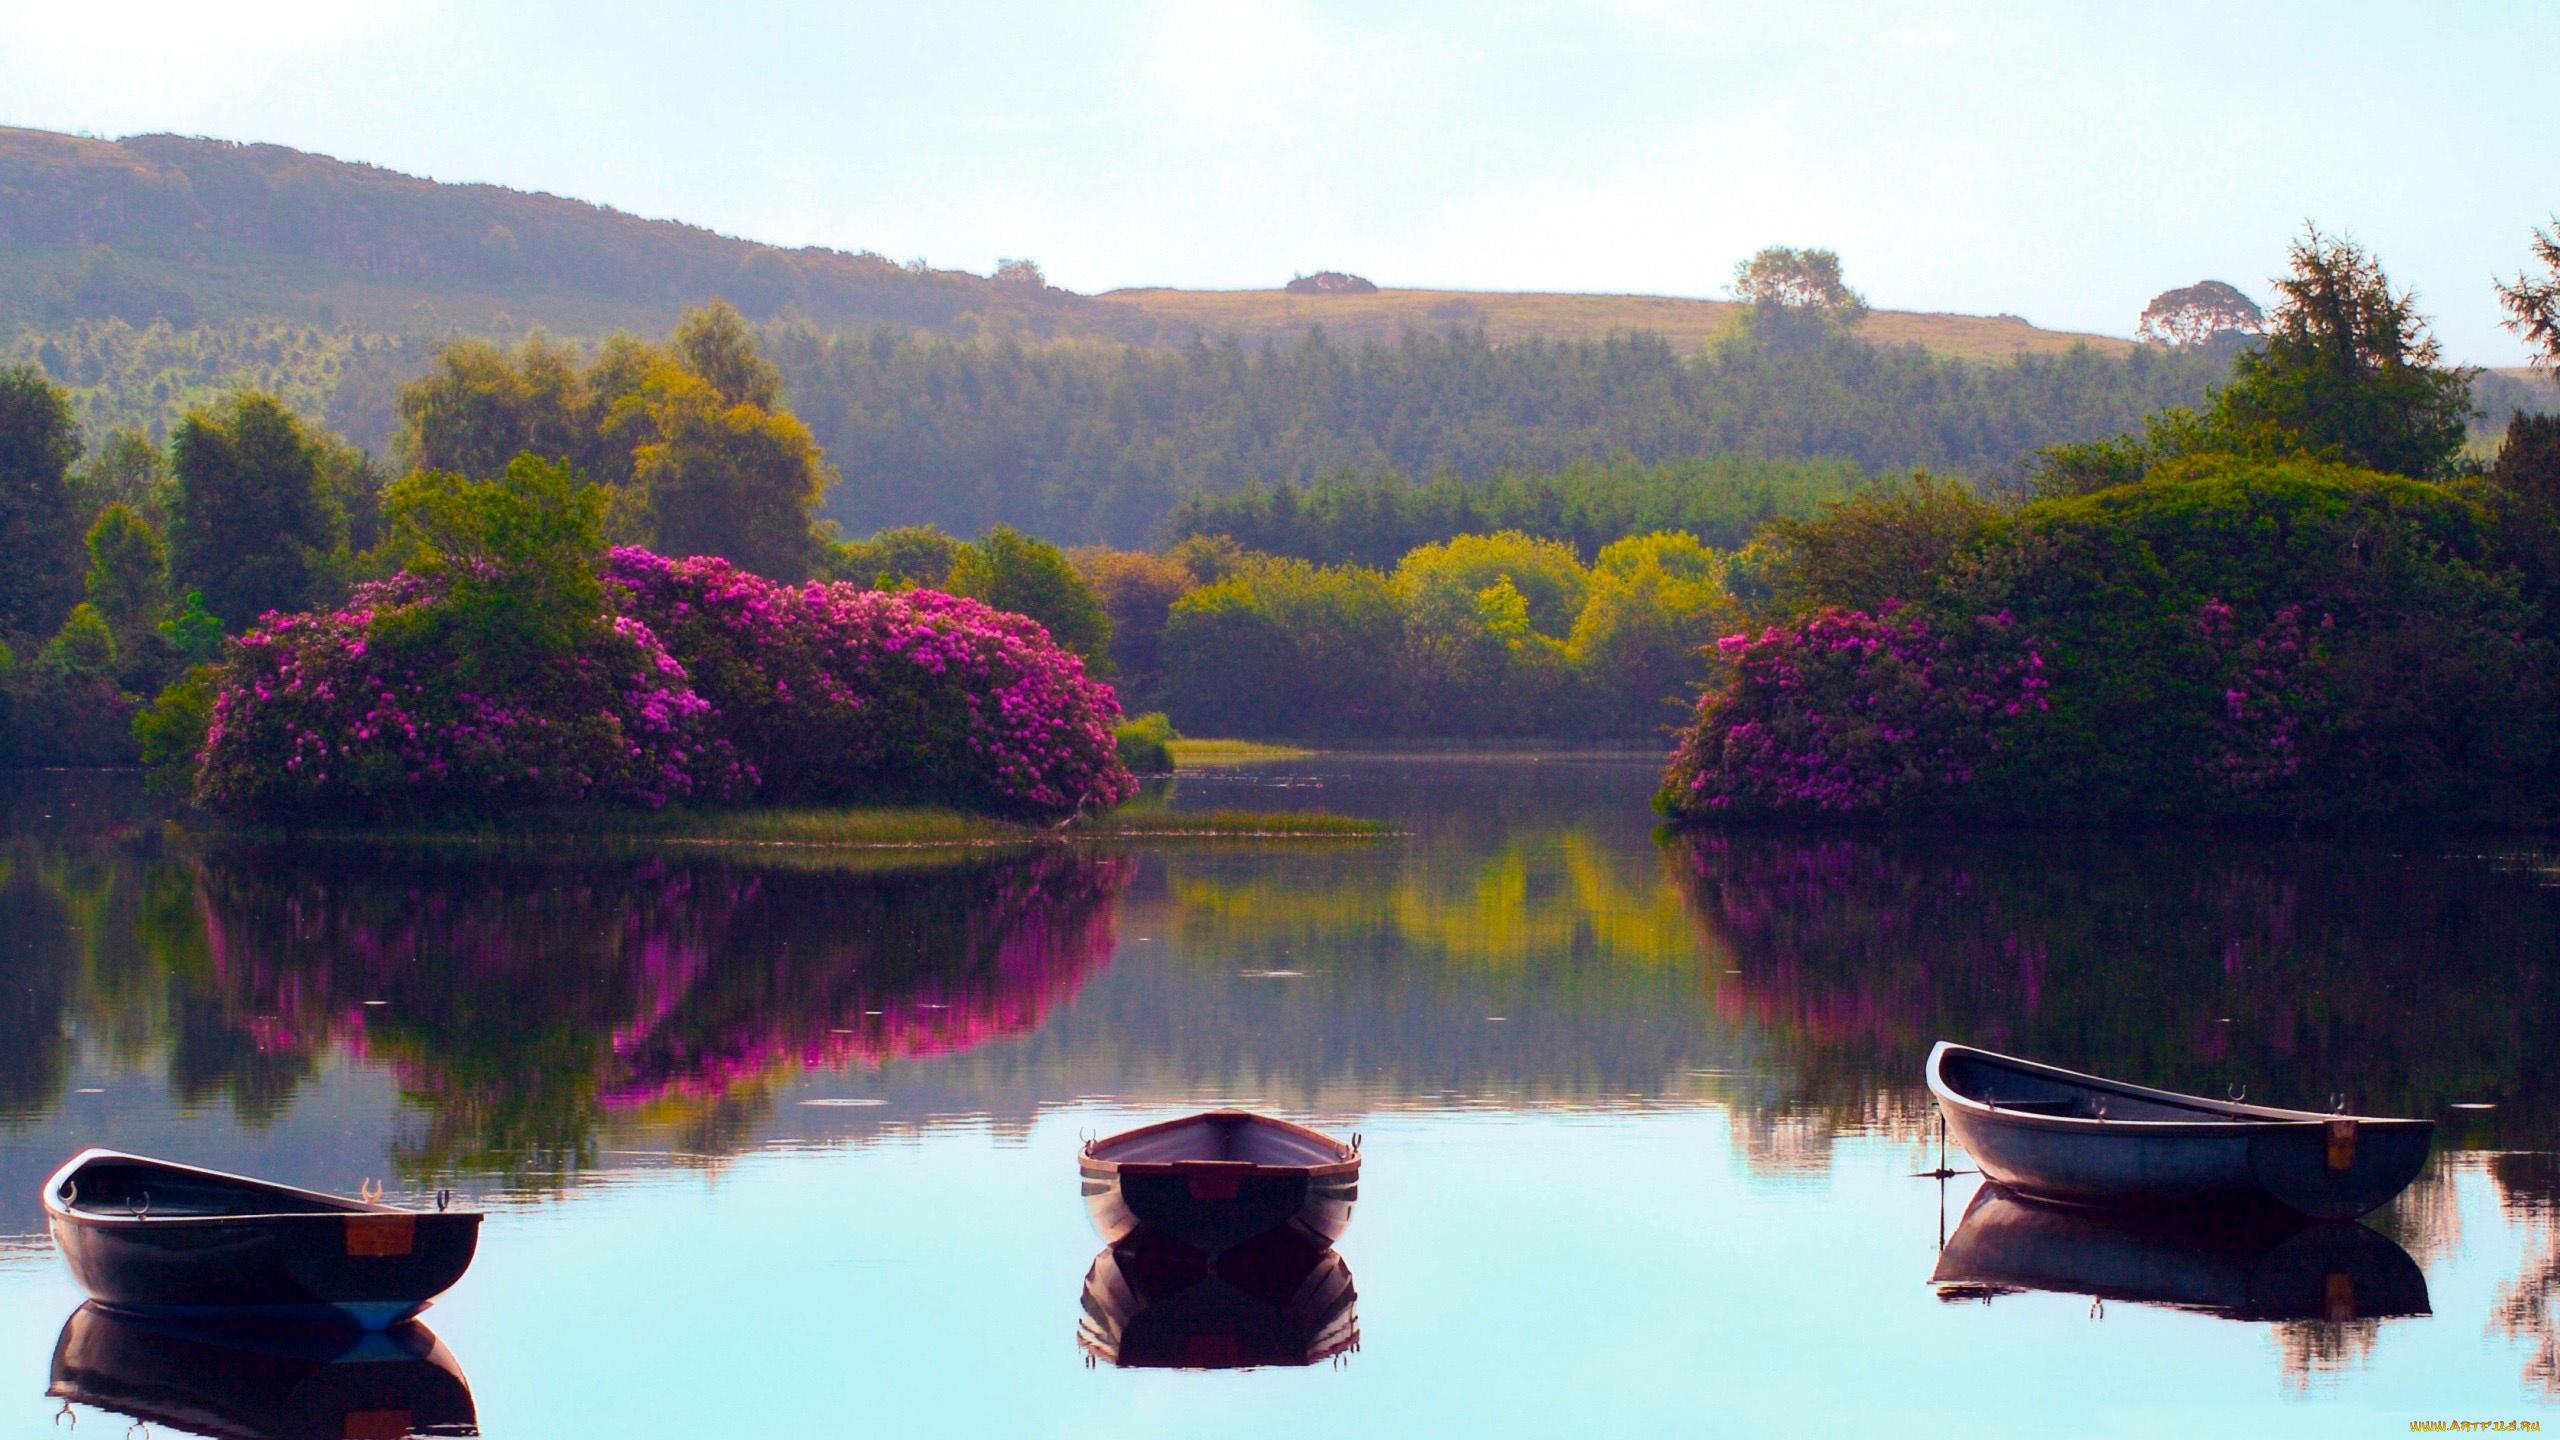 Лодка на берегу зеленого озера  № 2492981 бесплатно